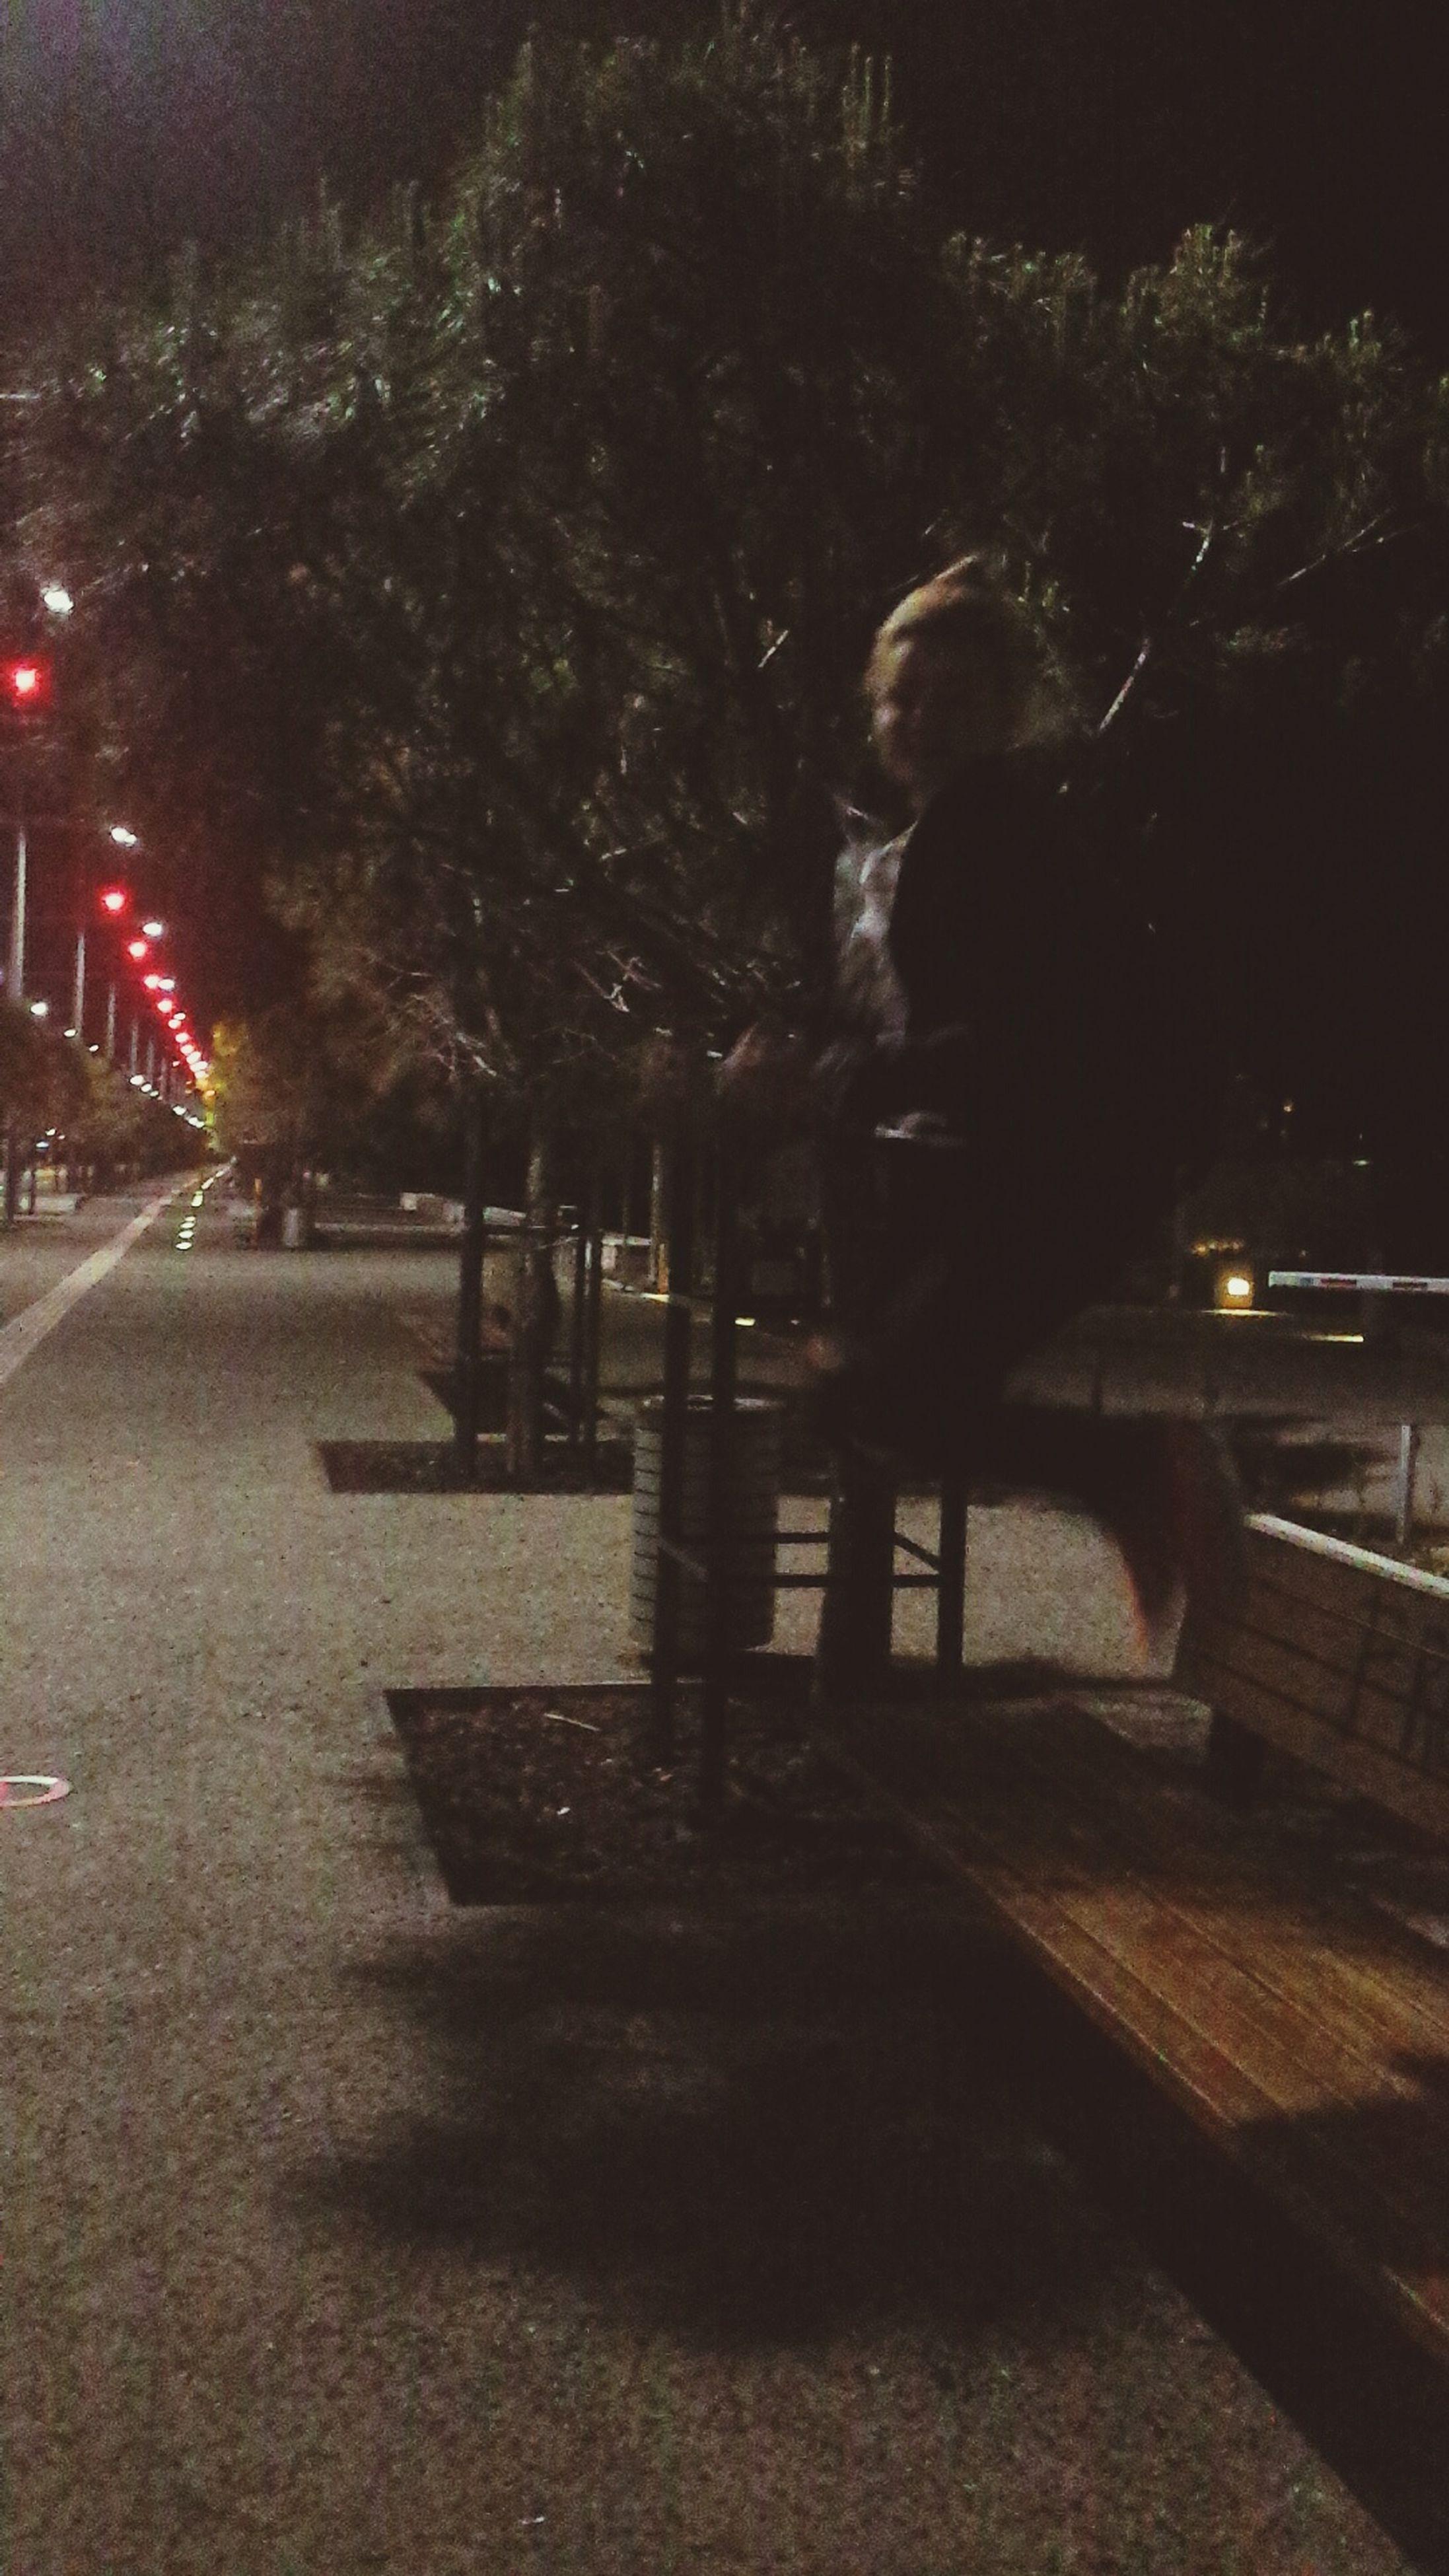 night, illuminated, street, road, street light, the way forward, transportation, walking, city, road marking, tree, lifestyles, sidewalk, men, full length, silhouette, outdoors, rear view